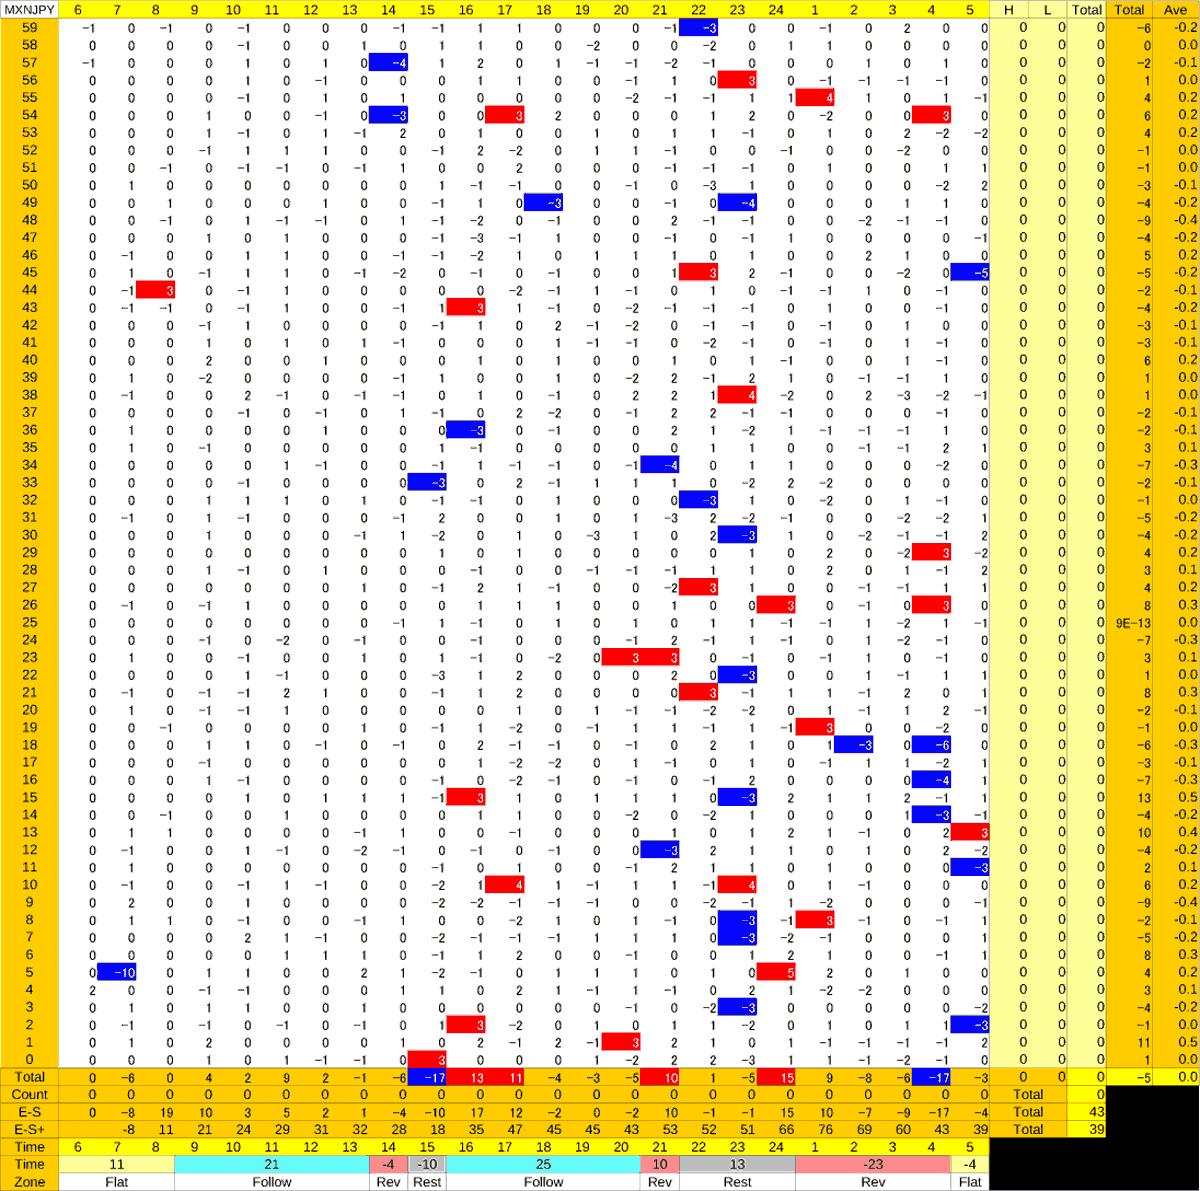 20200811_HS(3)MXNJPY